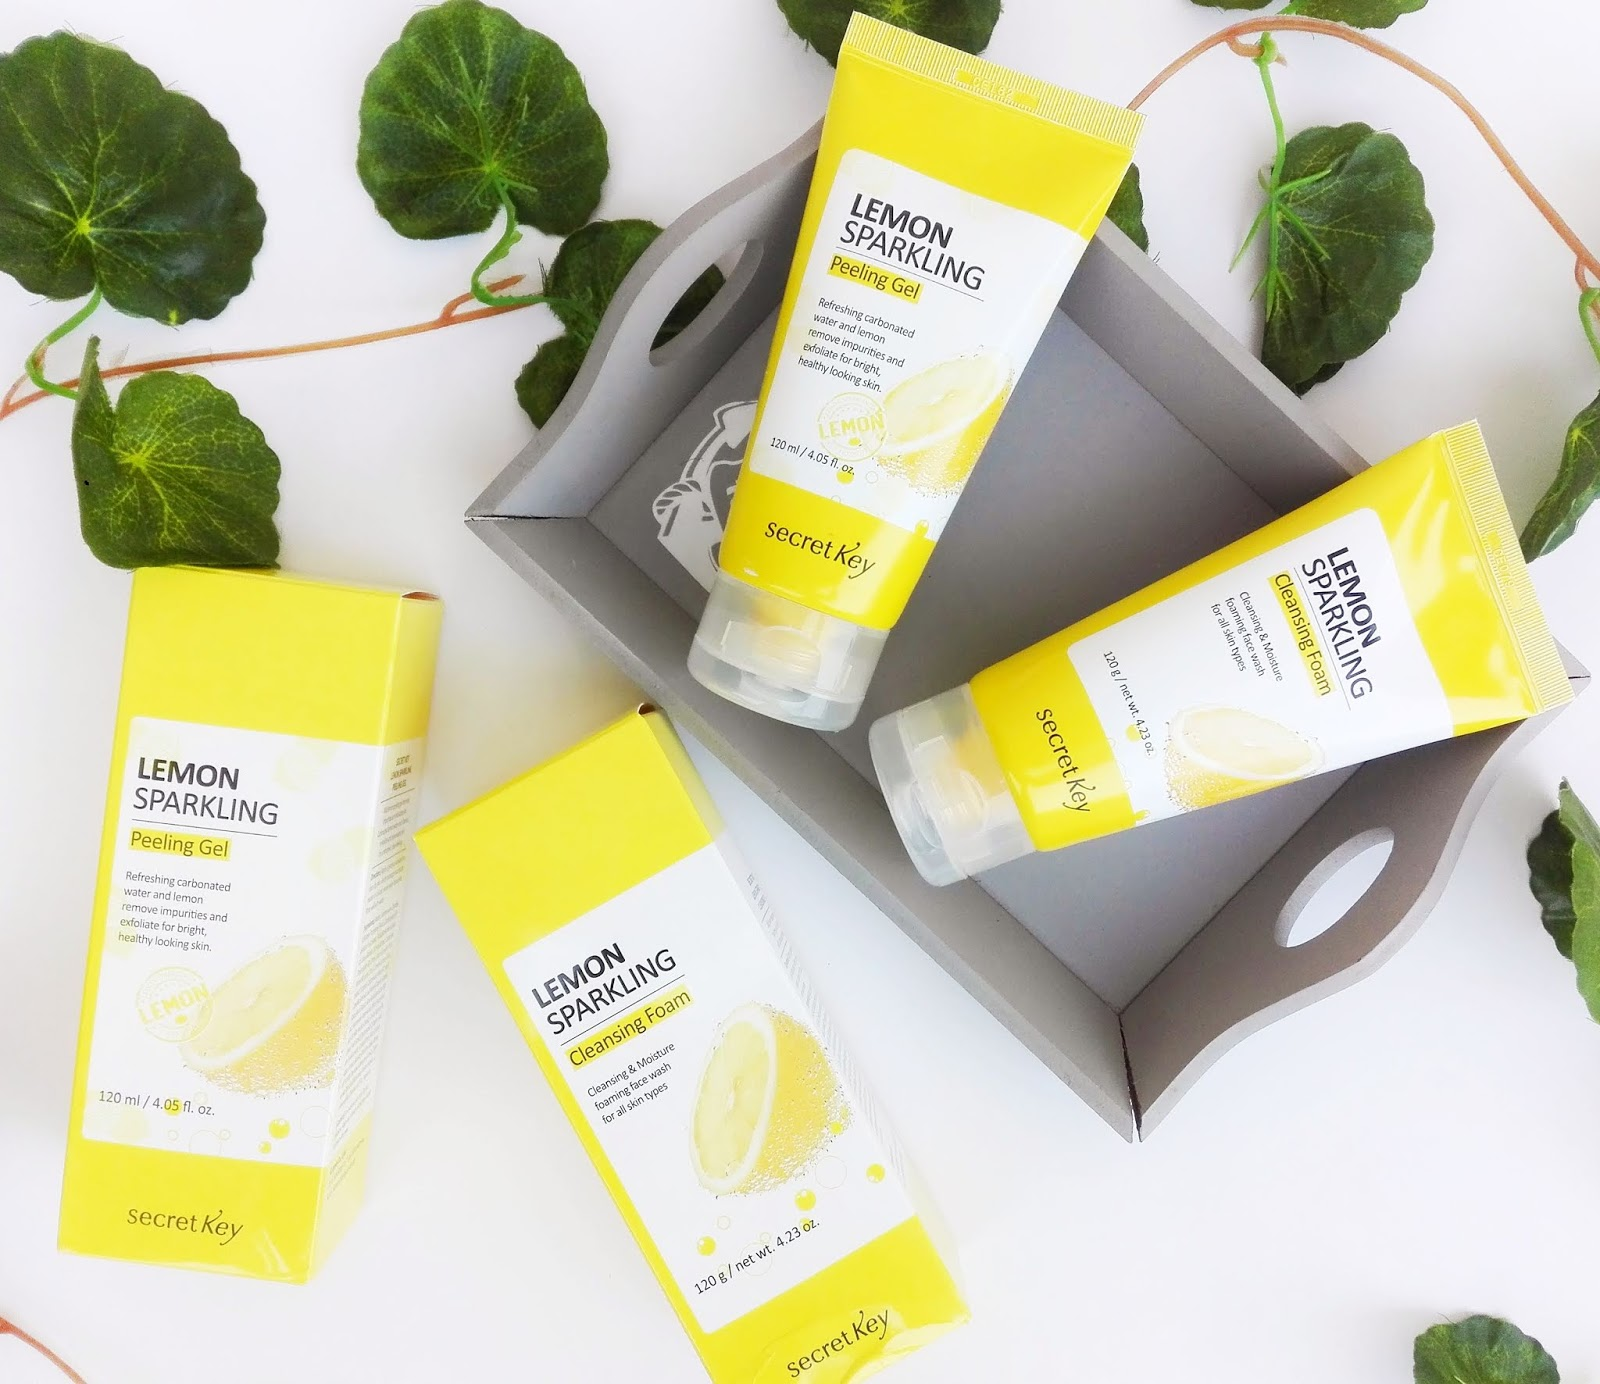 Review Secret Key Lemon Sparkling Cleansing Foam Lemon Sparkling Peeling Gel Beauty Dewdrop Blog